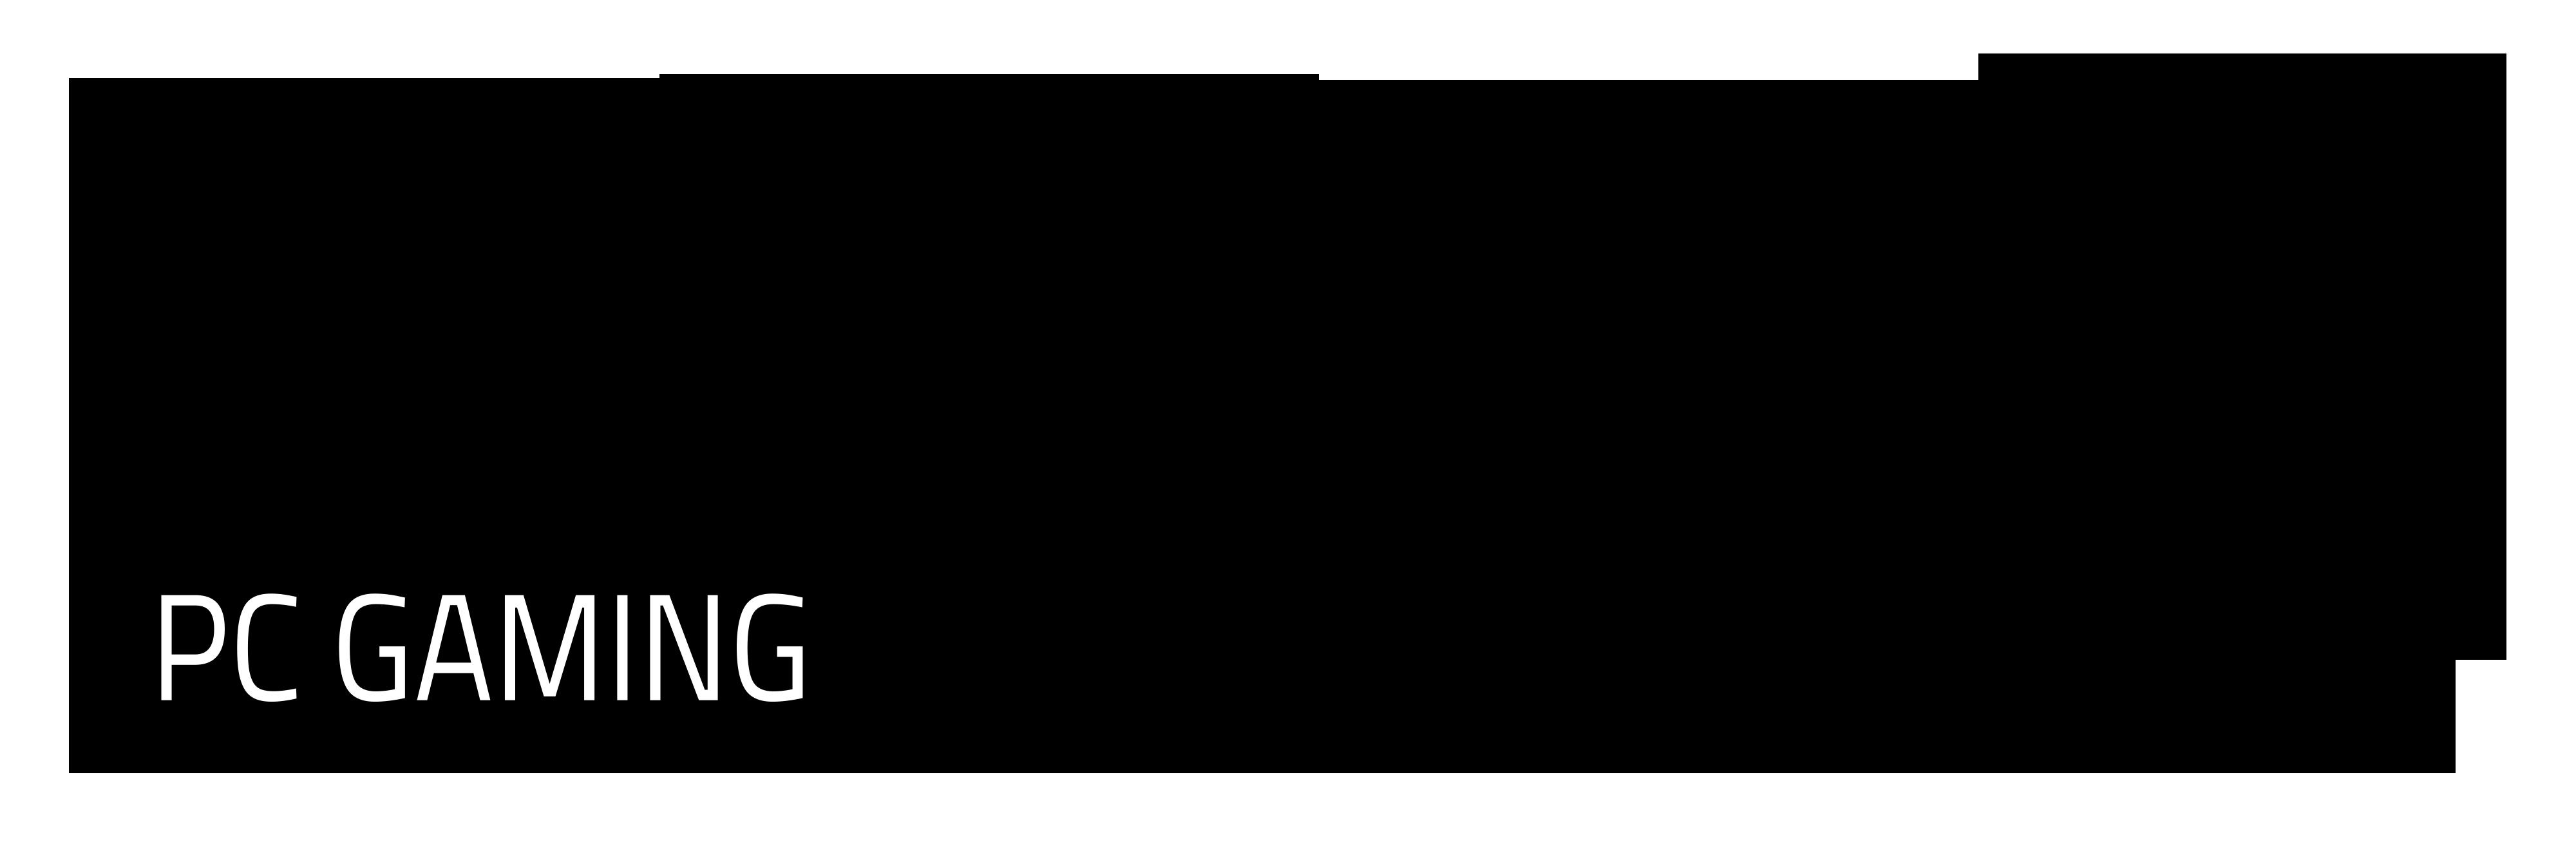 Actina gaming logo